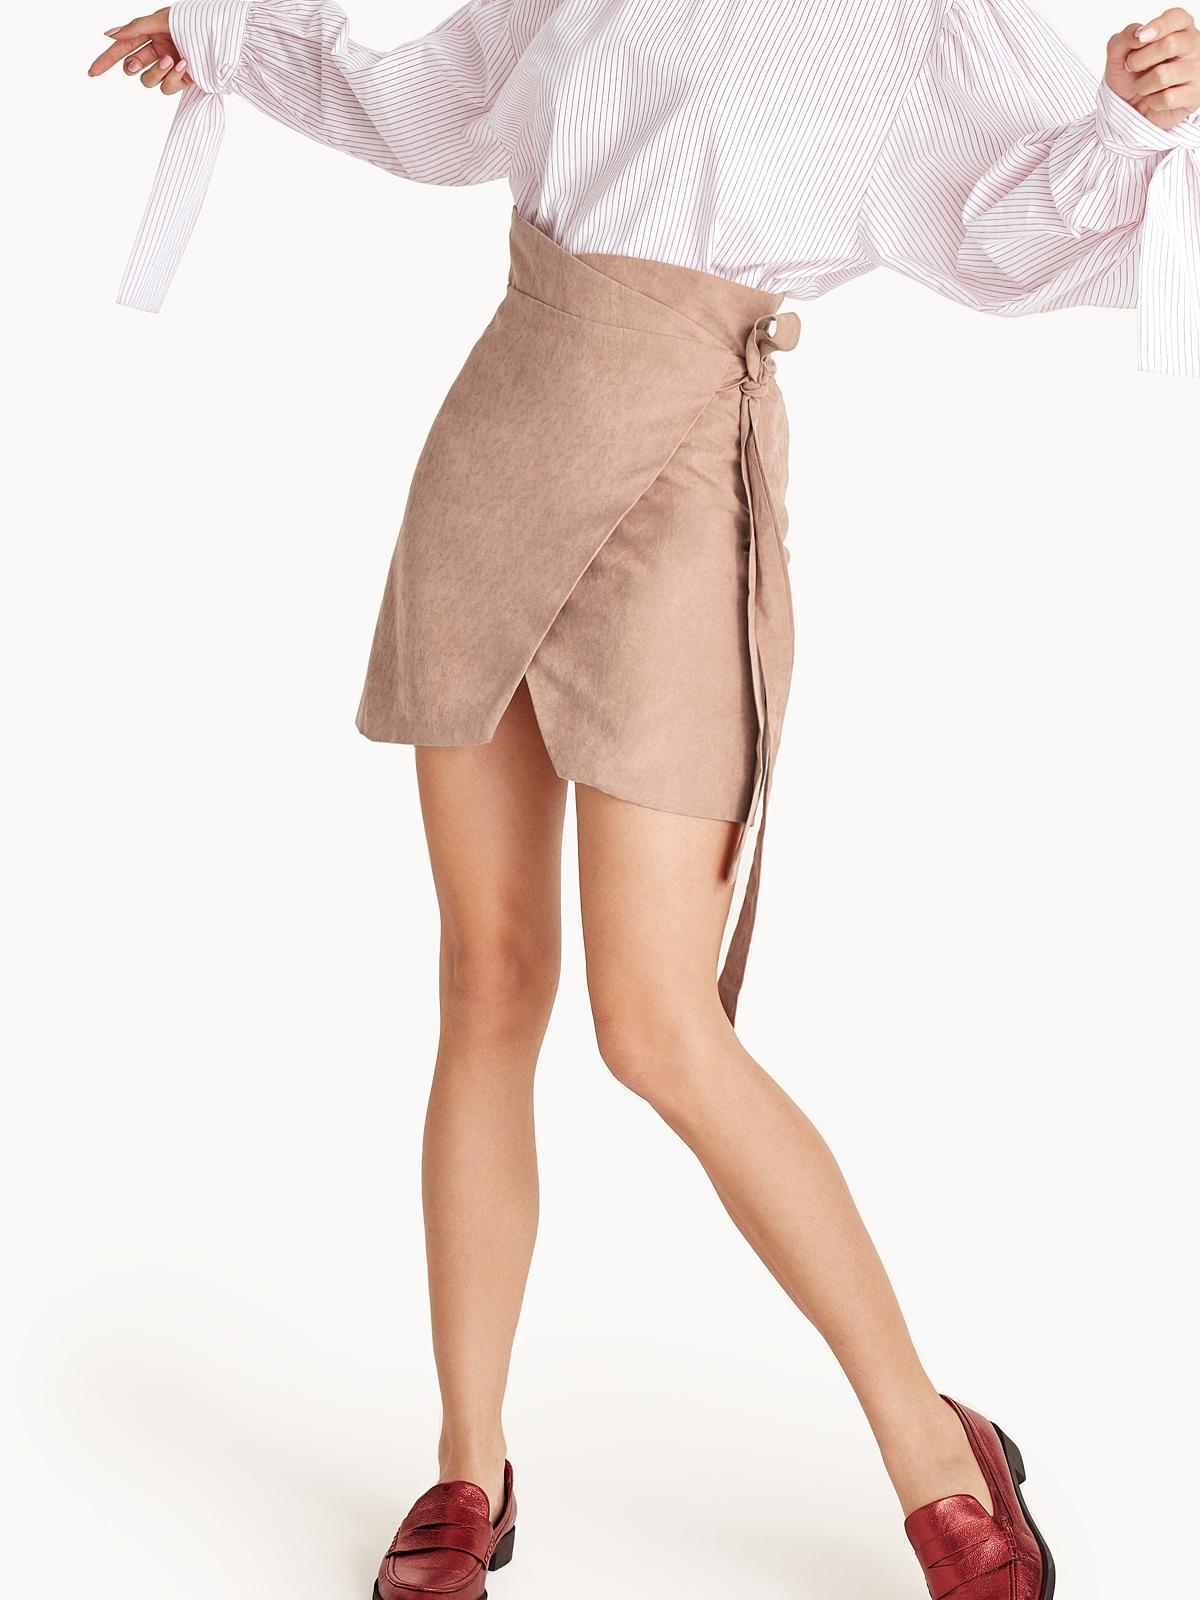 7586badad043 Devin Mini Faux Suede Wrap Skirt - Pomelo Fashion